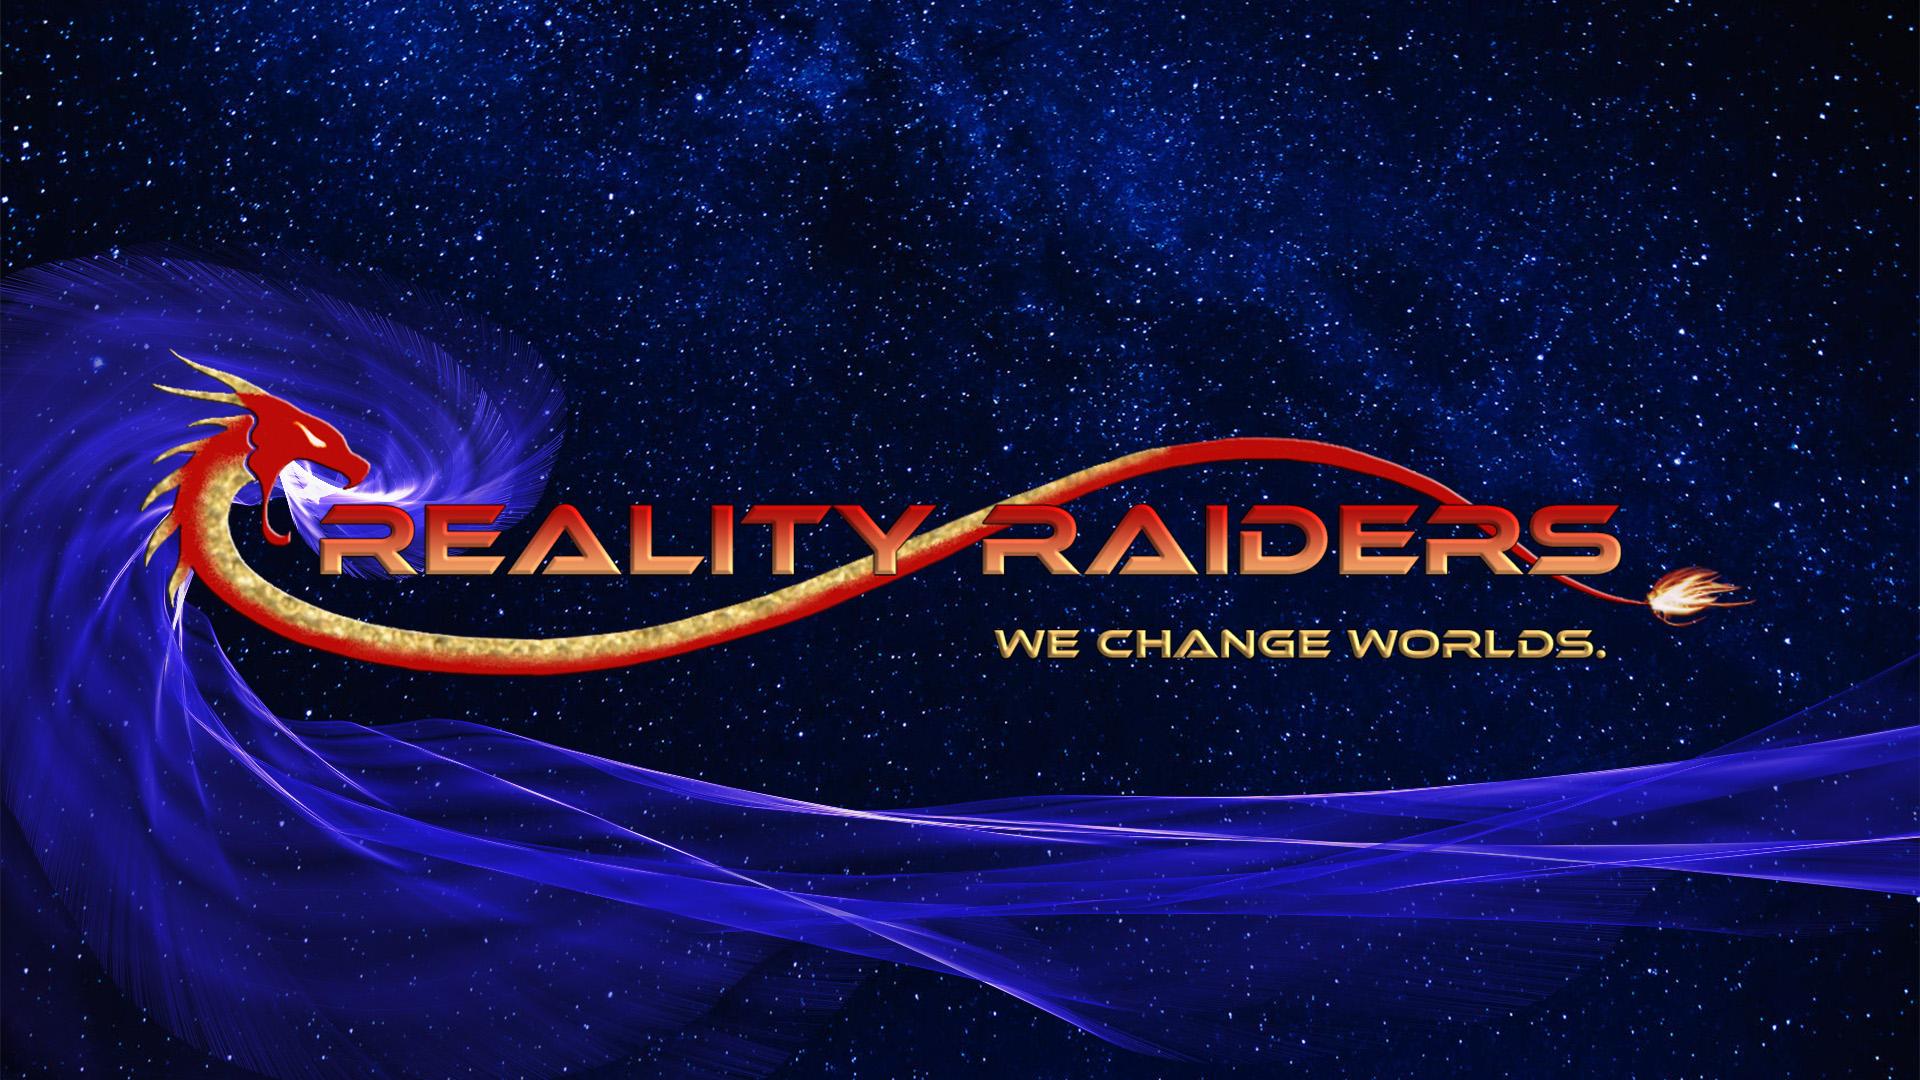 Reality Raiders Banner